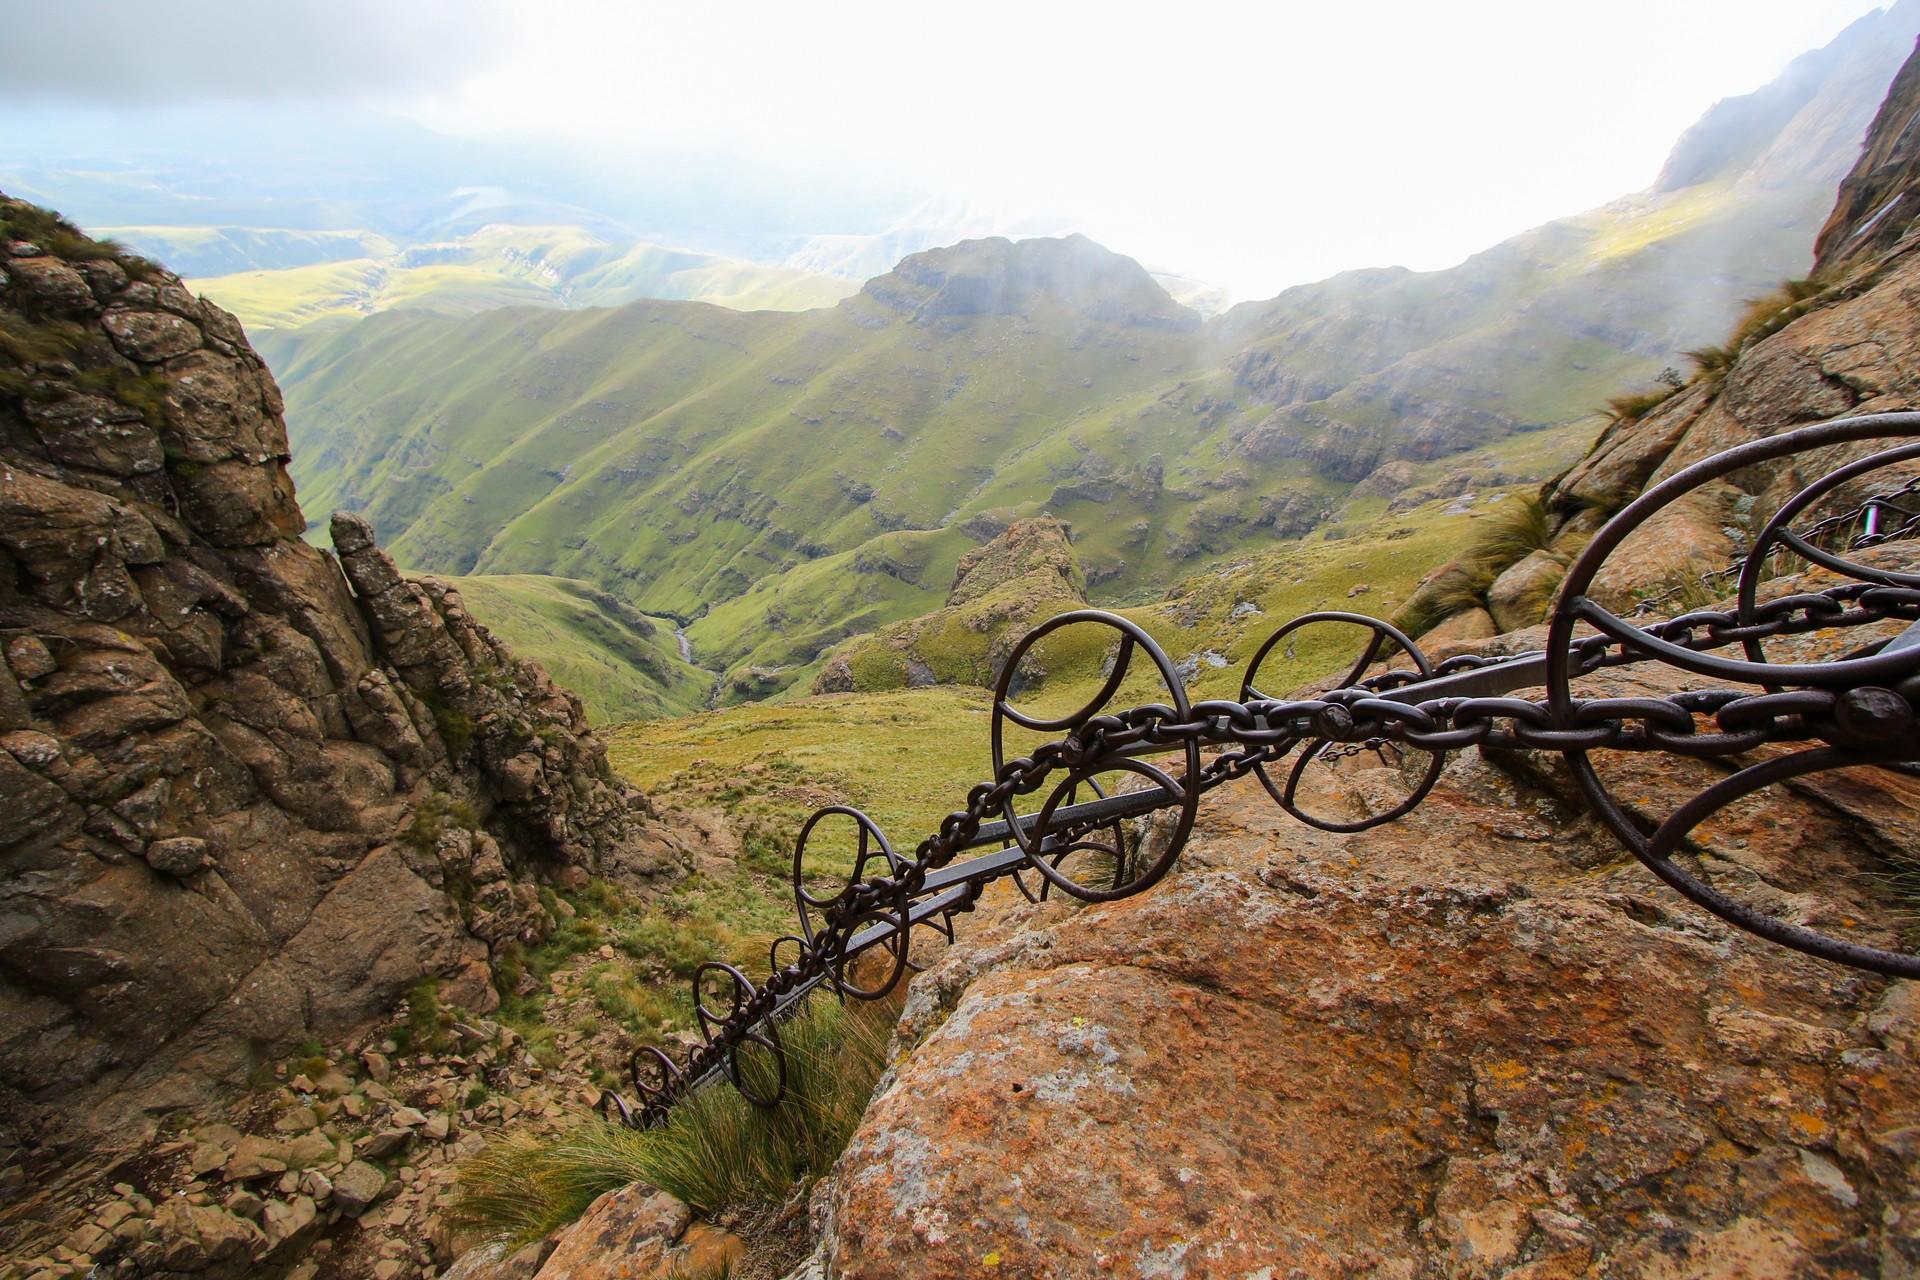 Chain ladders on Sentinal Peak Hike, Drakensberg, South Africa